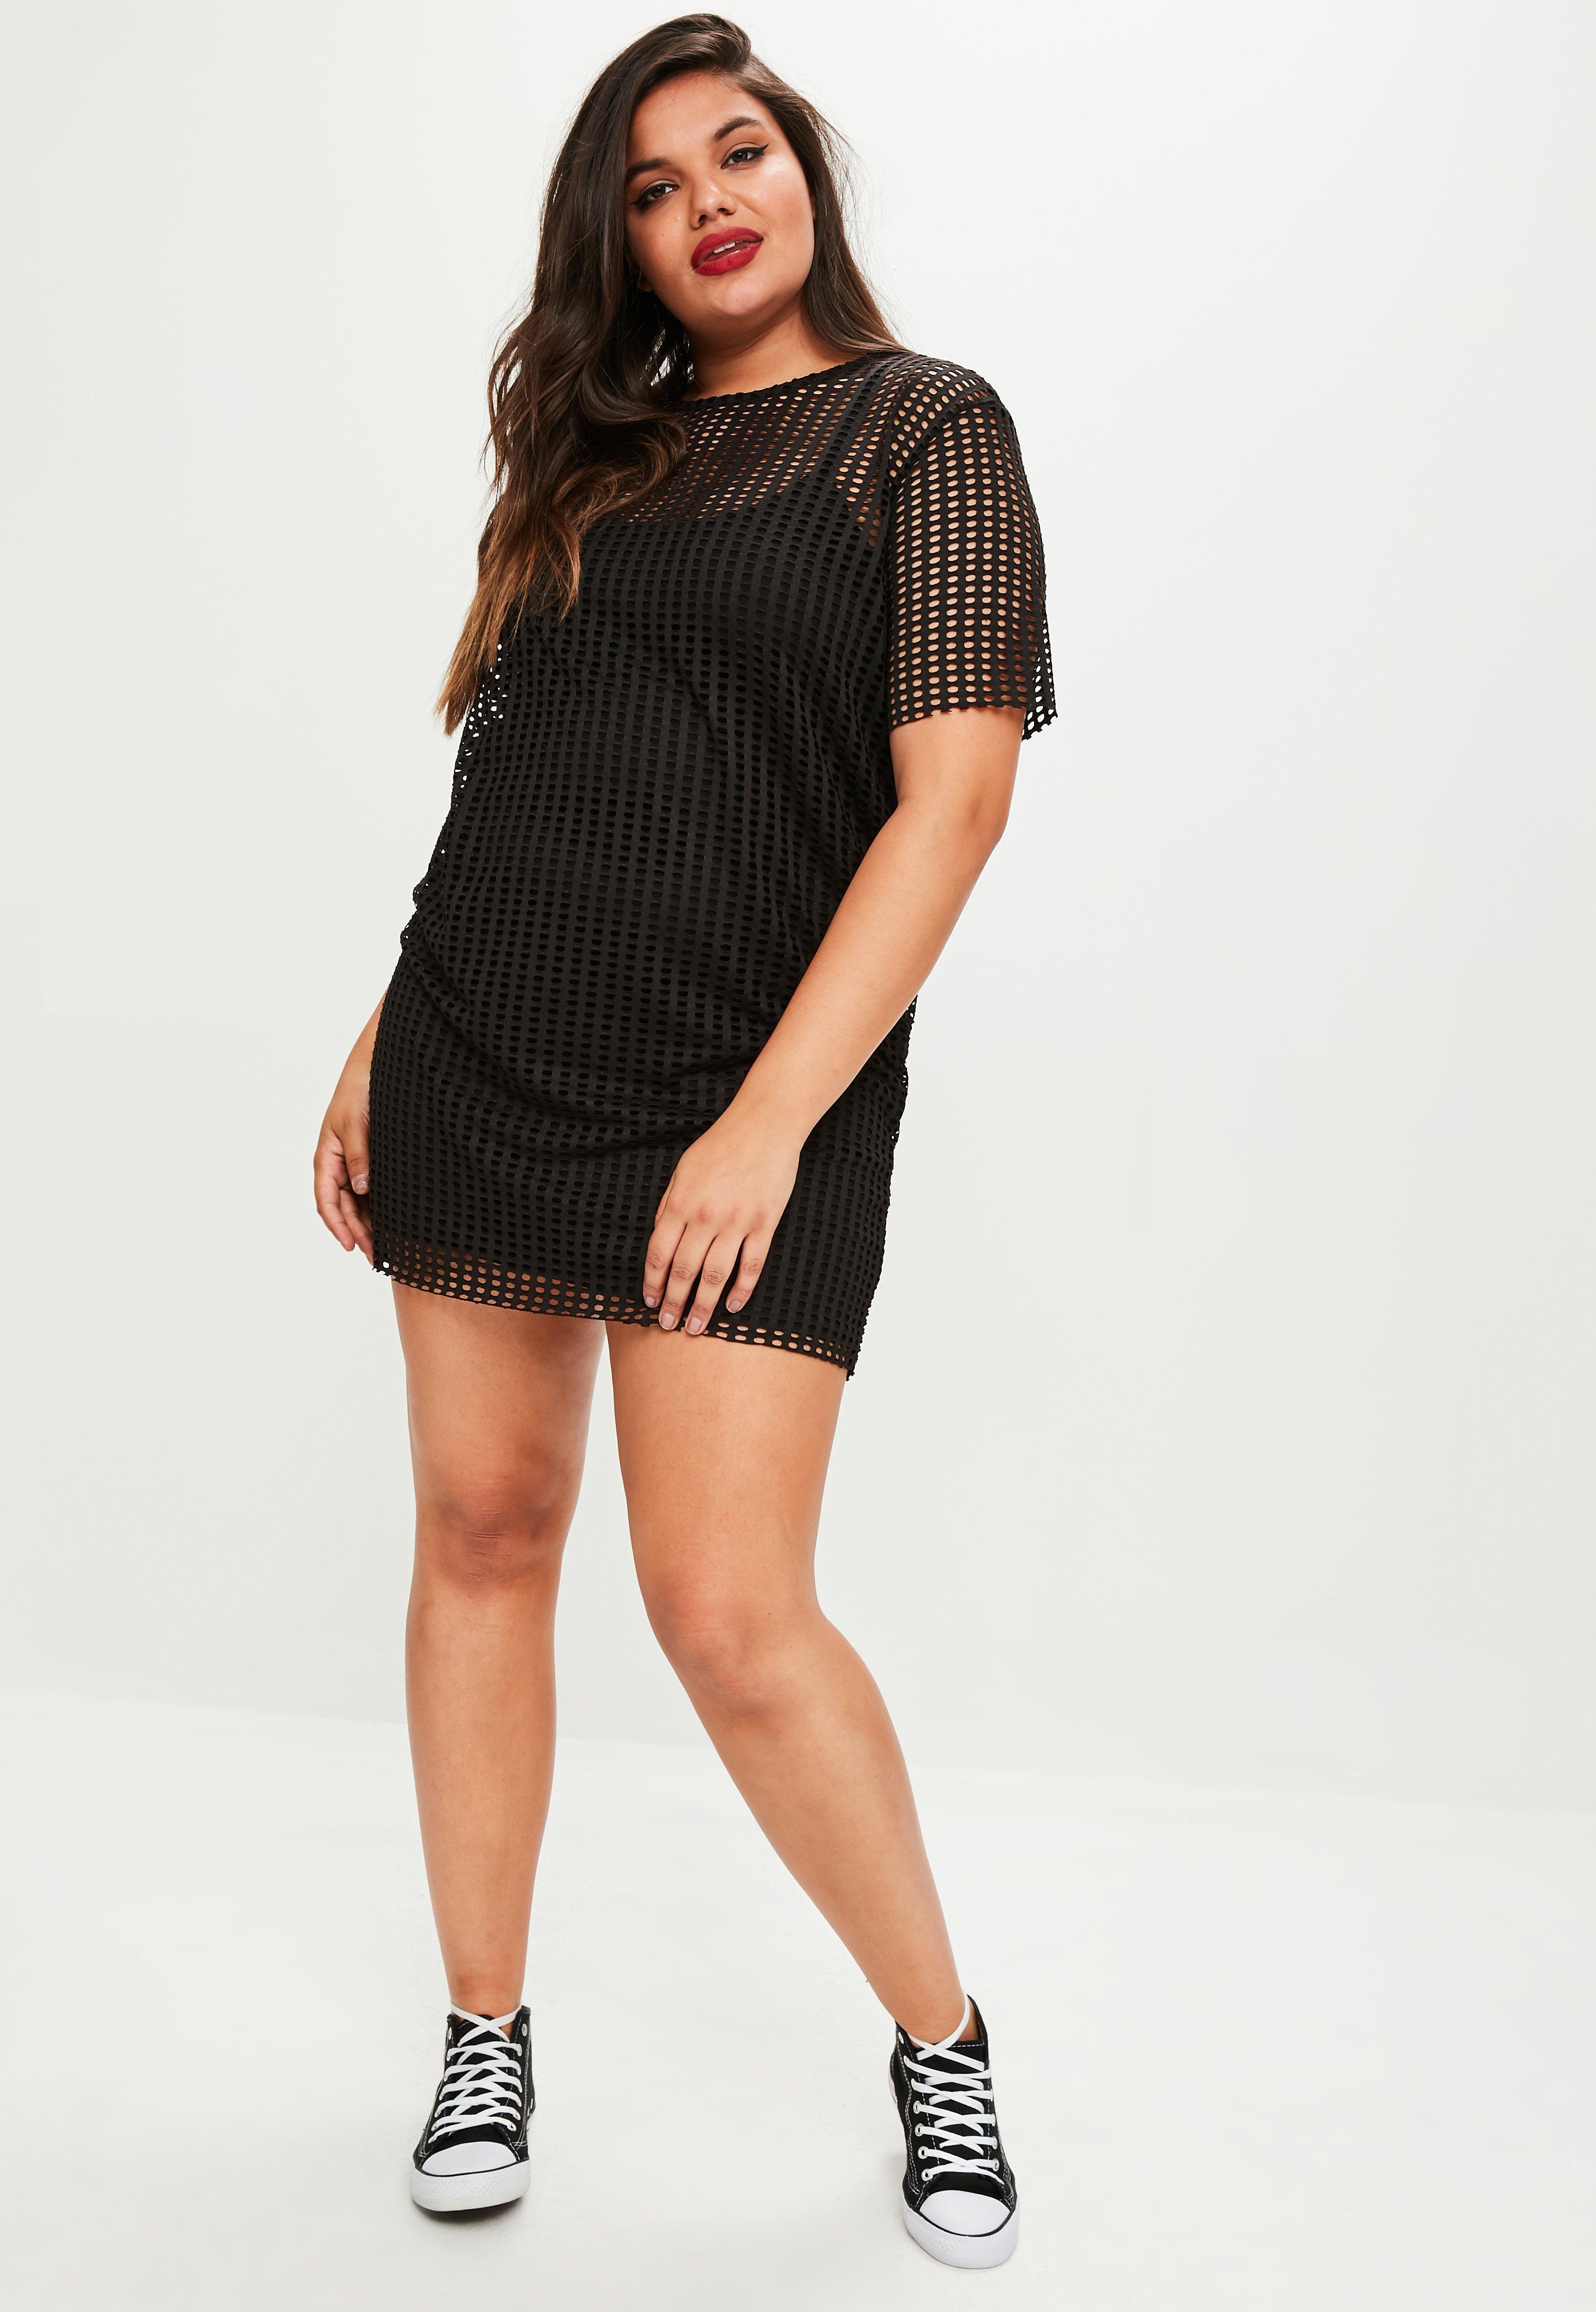 d2e15c4ca13 Lyst - Missguided Plus Size Black Fishnet Mesh T-shirt Dress in Black